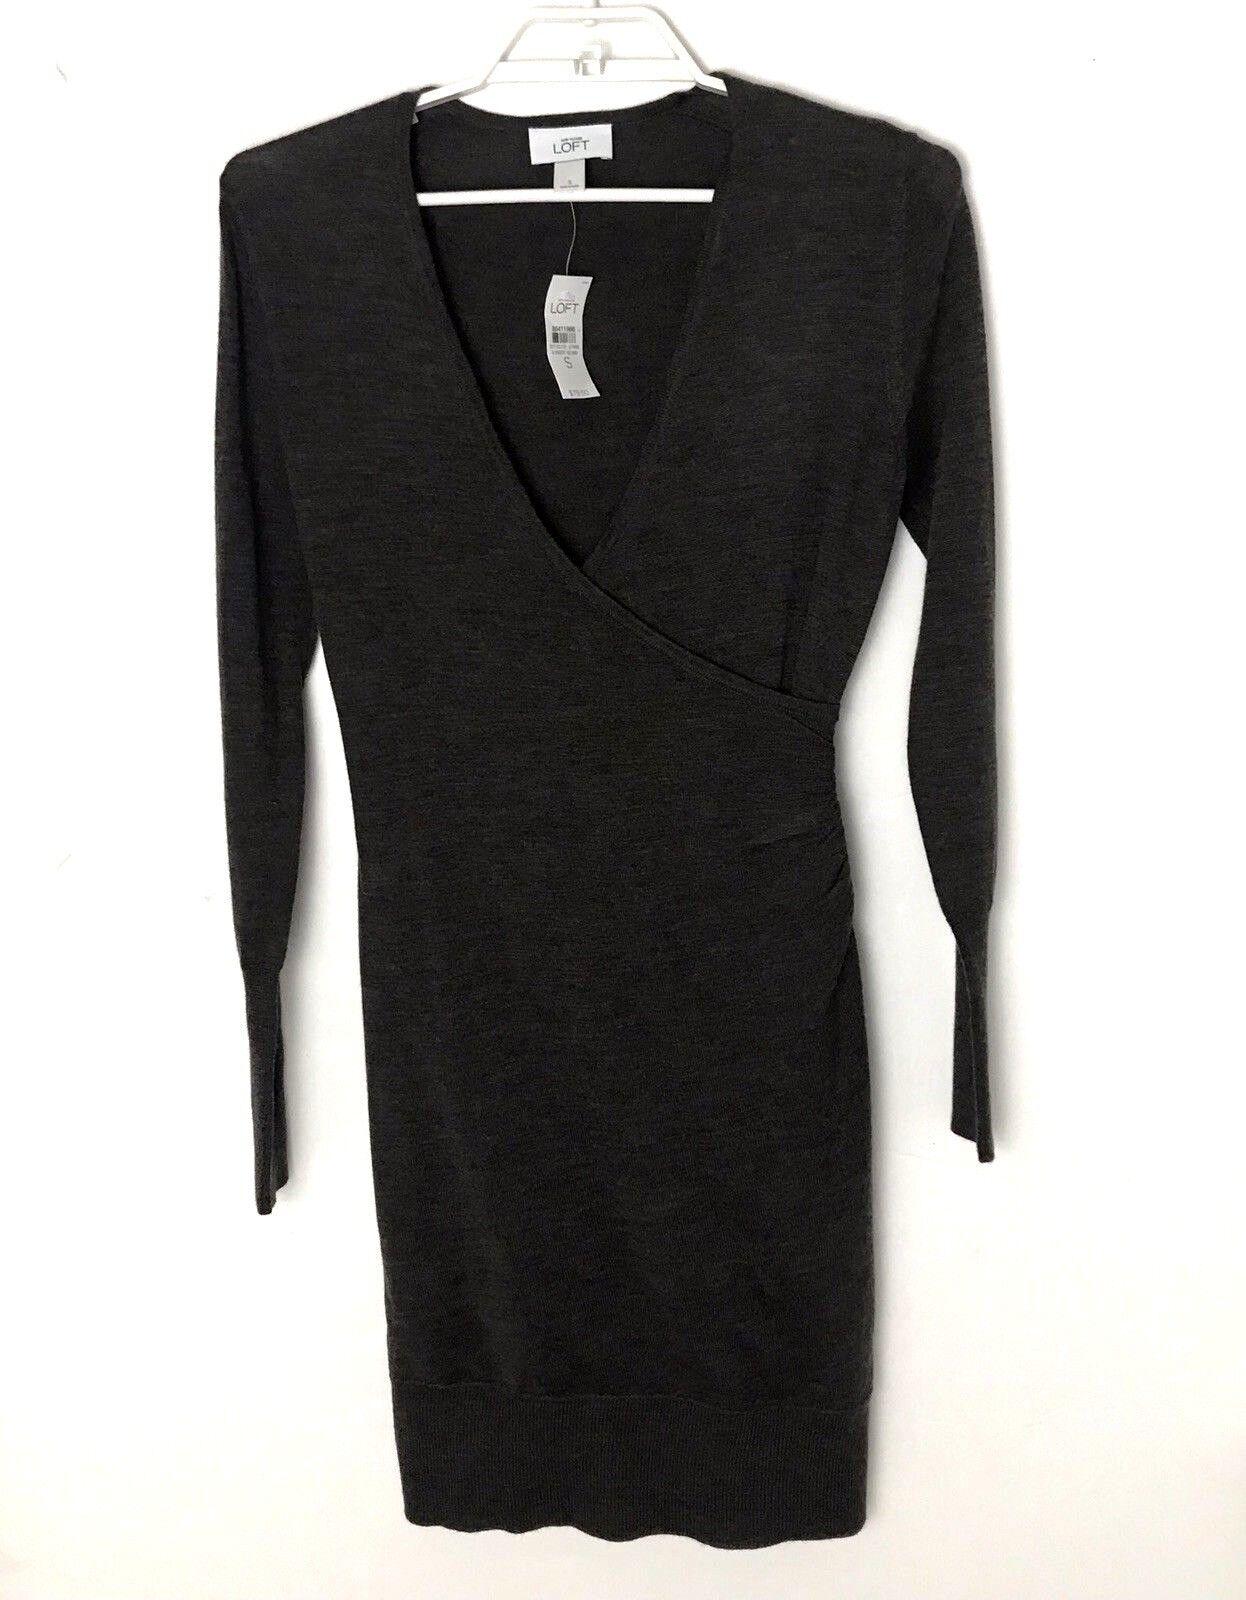 NWT Ann Taylor Loft Brown Merino Wool Blend Long sleeve Sweater Dress Small